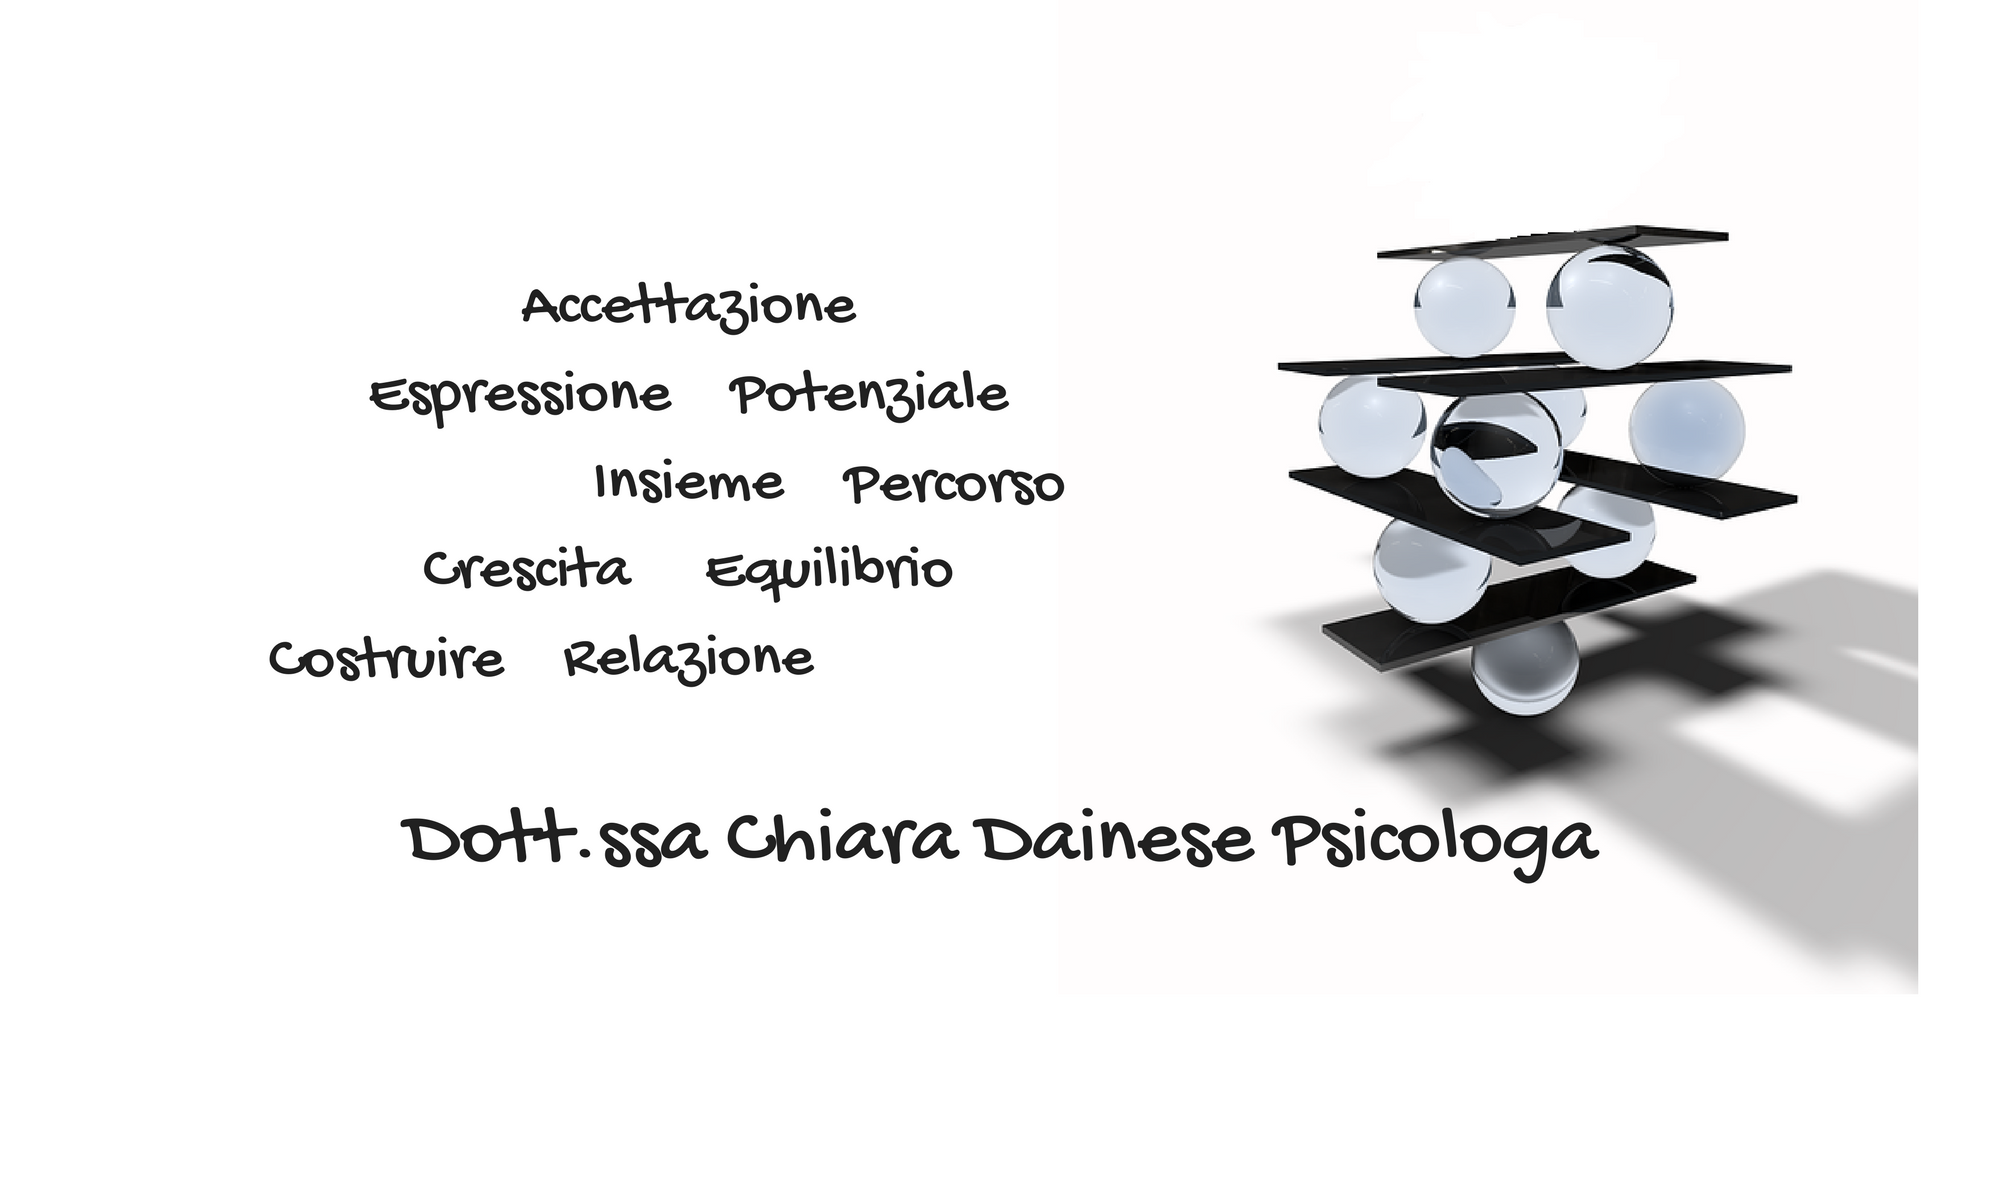 Chiara Dainese Psicologa